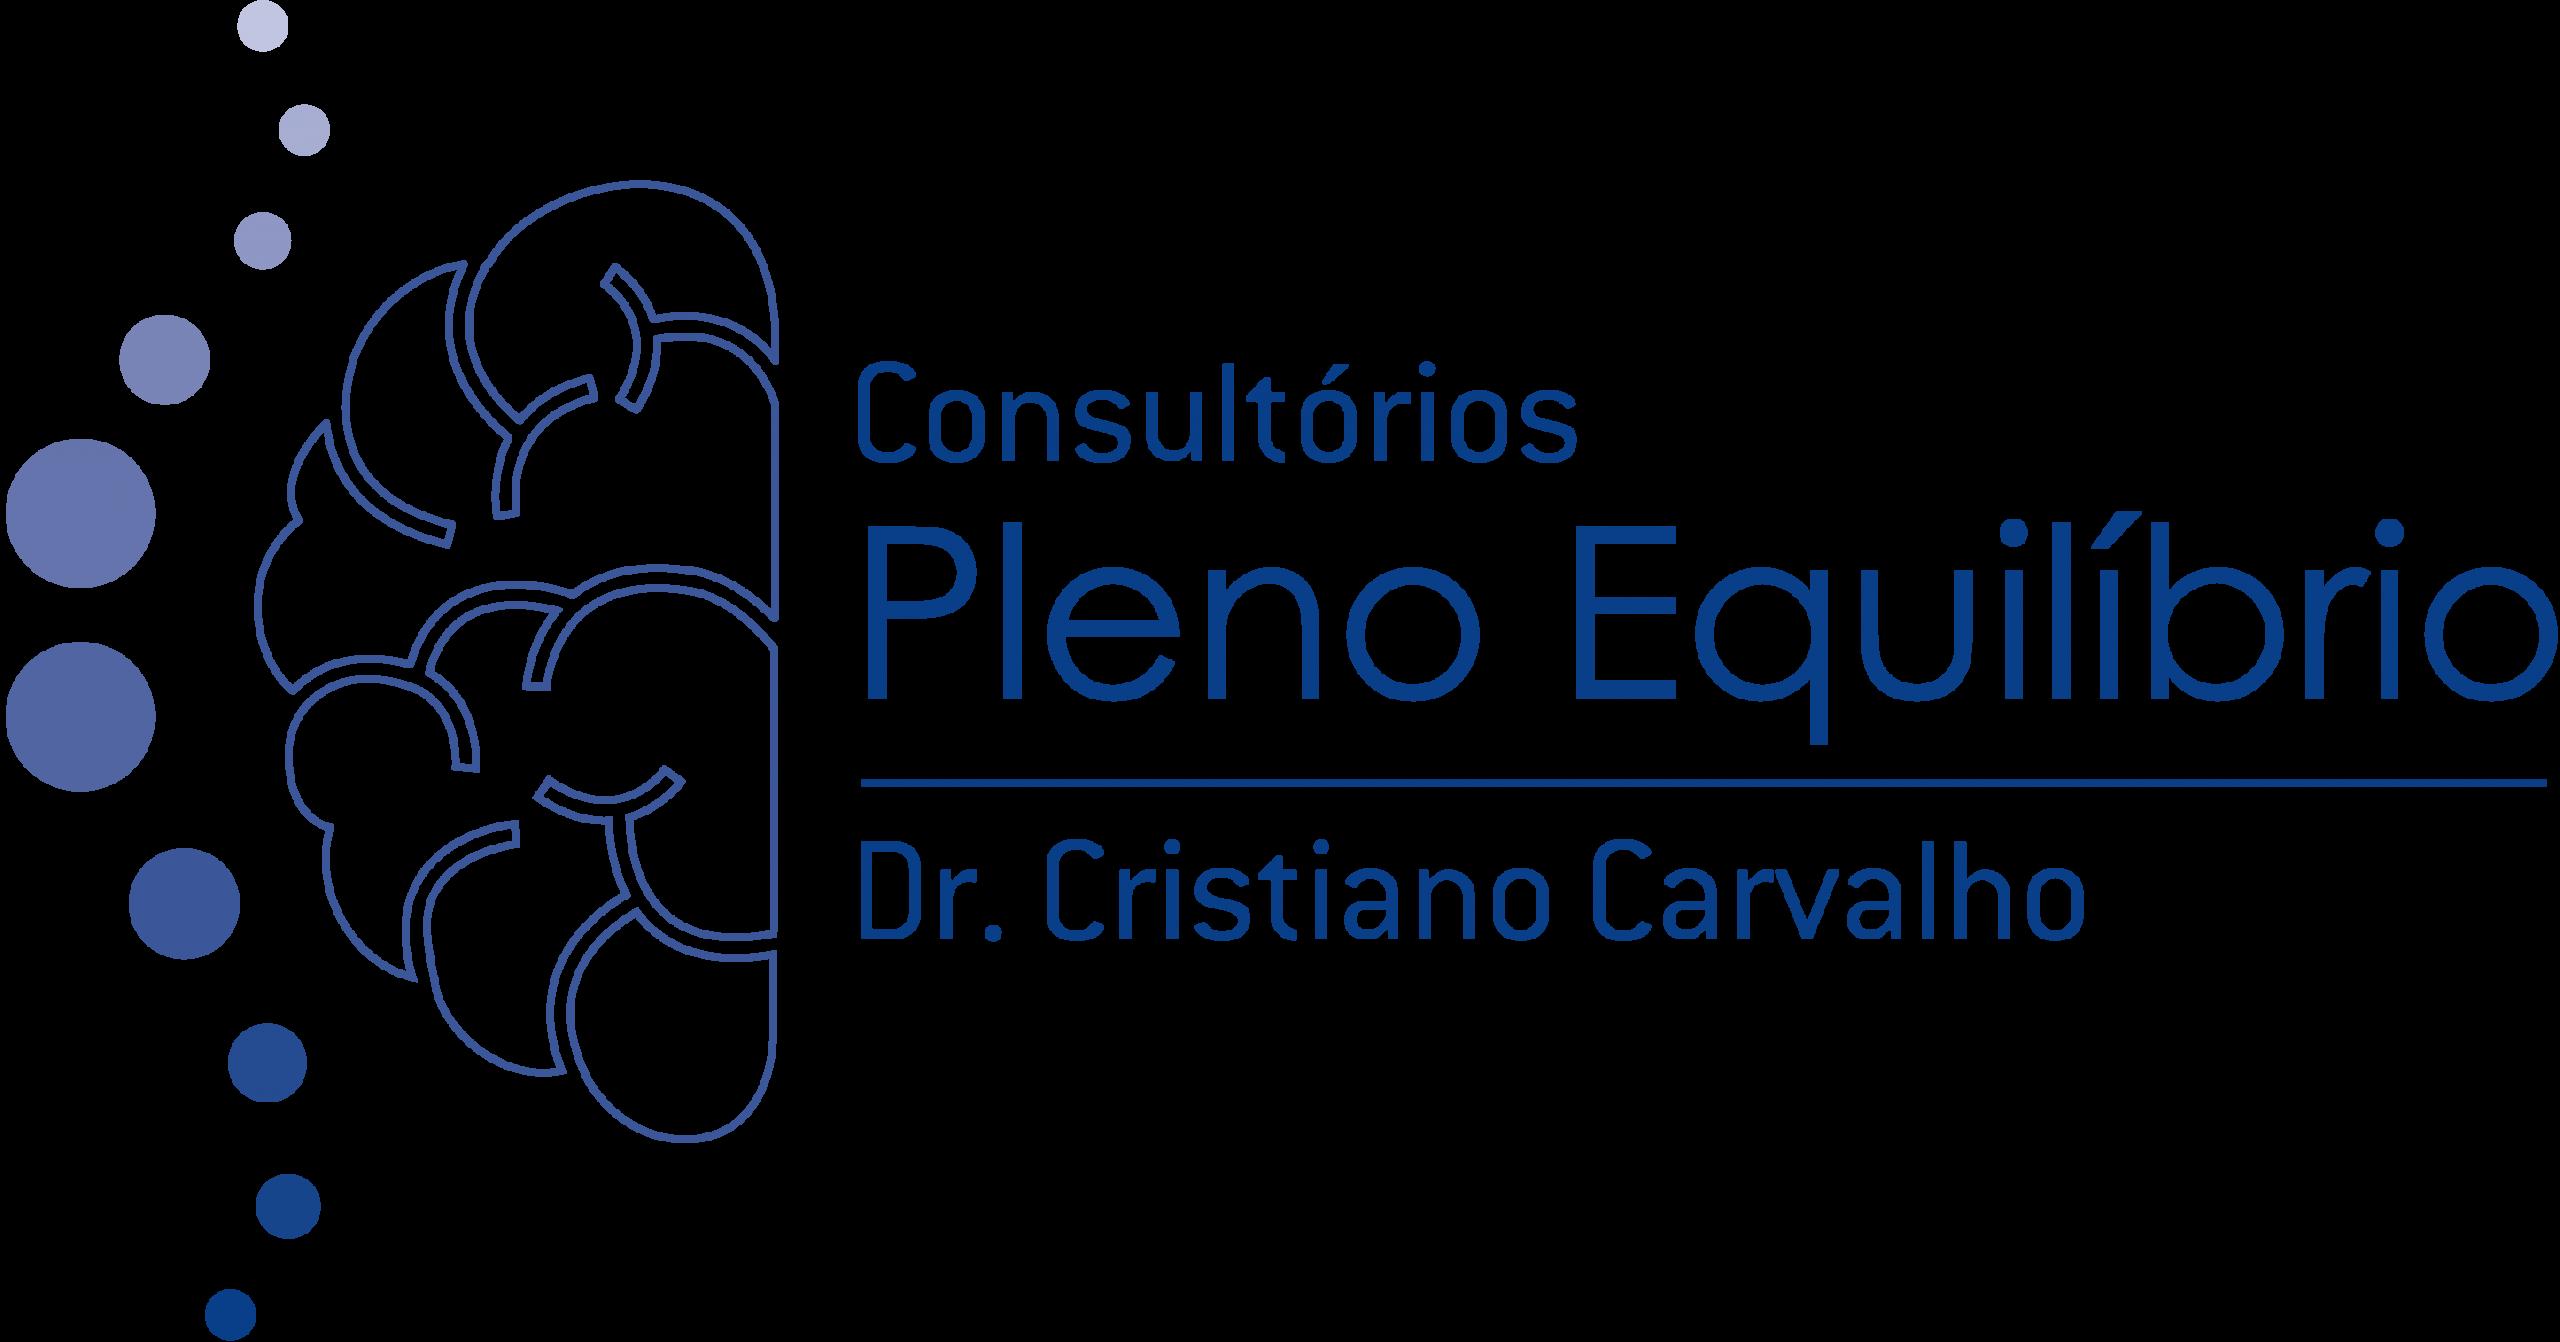 Clínica Pleno Equilíbrio   Osteopatia, Hipnoterapia/Psicologia